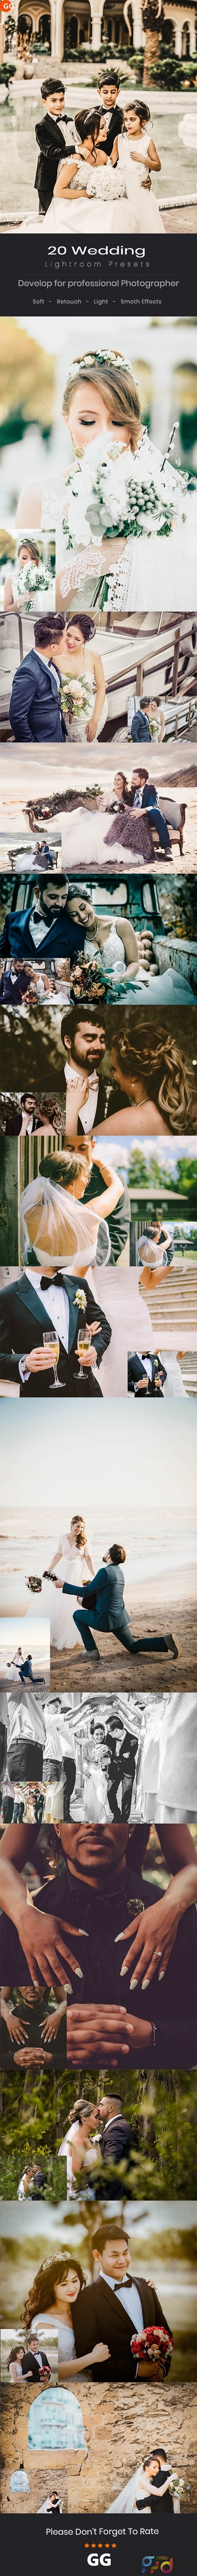 20 Wedding Lightroom Presets 25396455 1